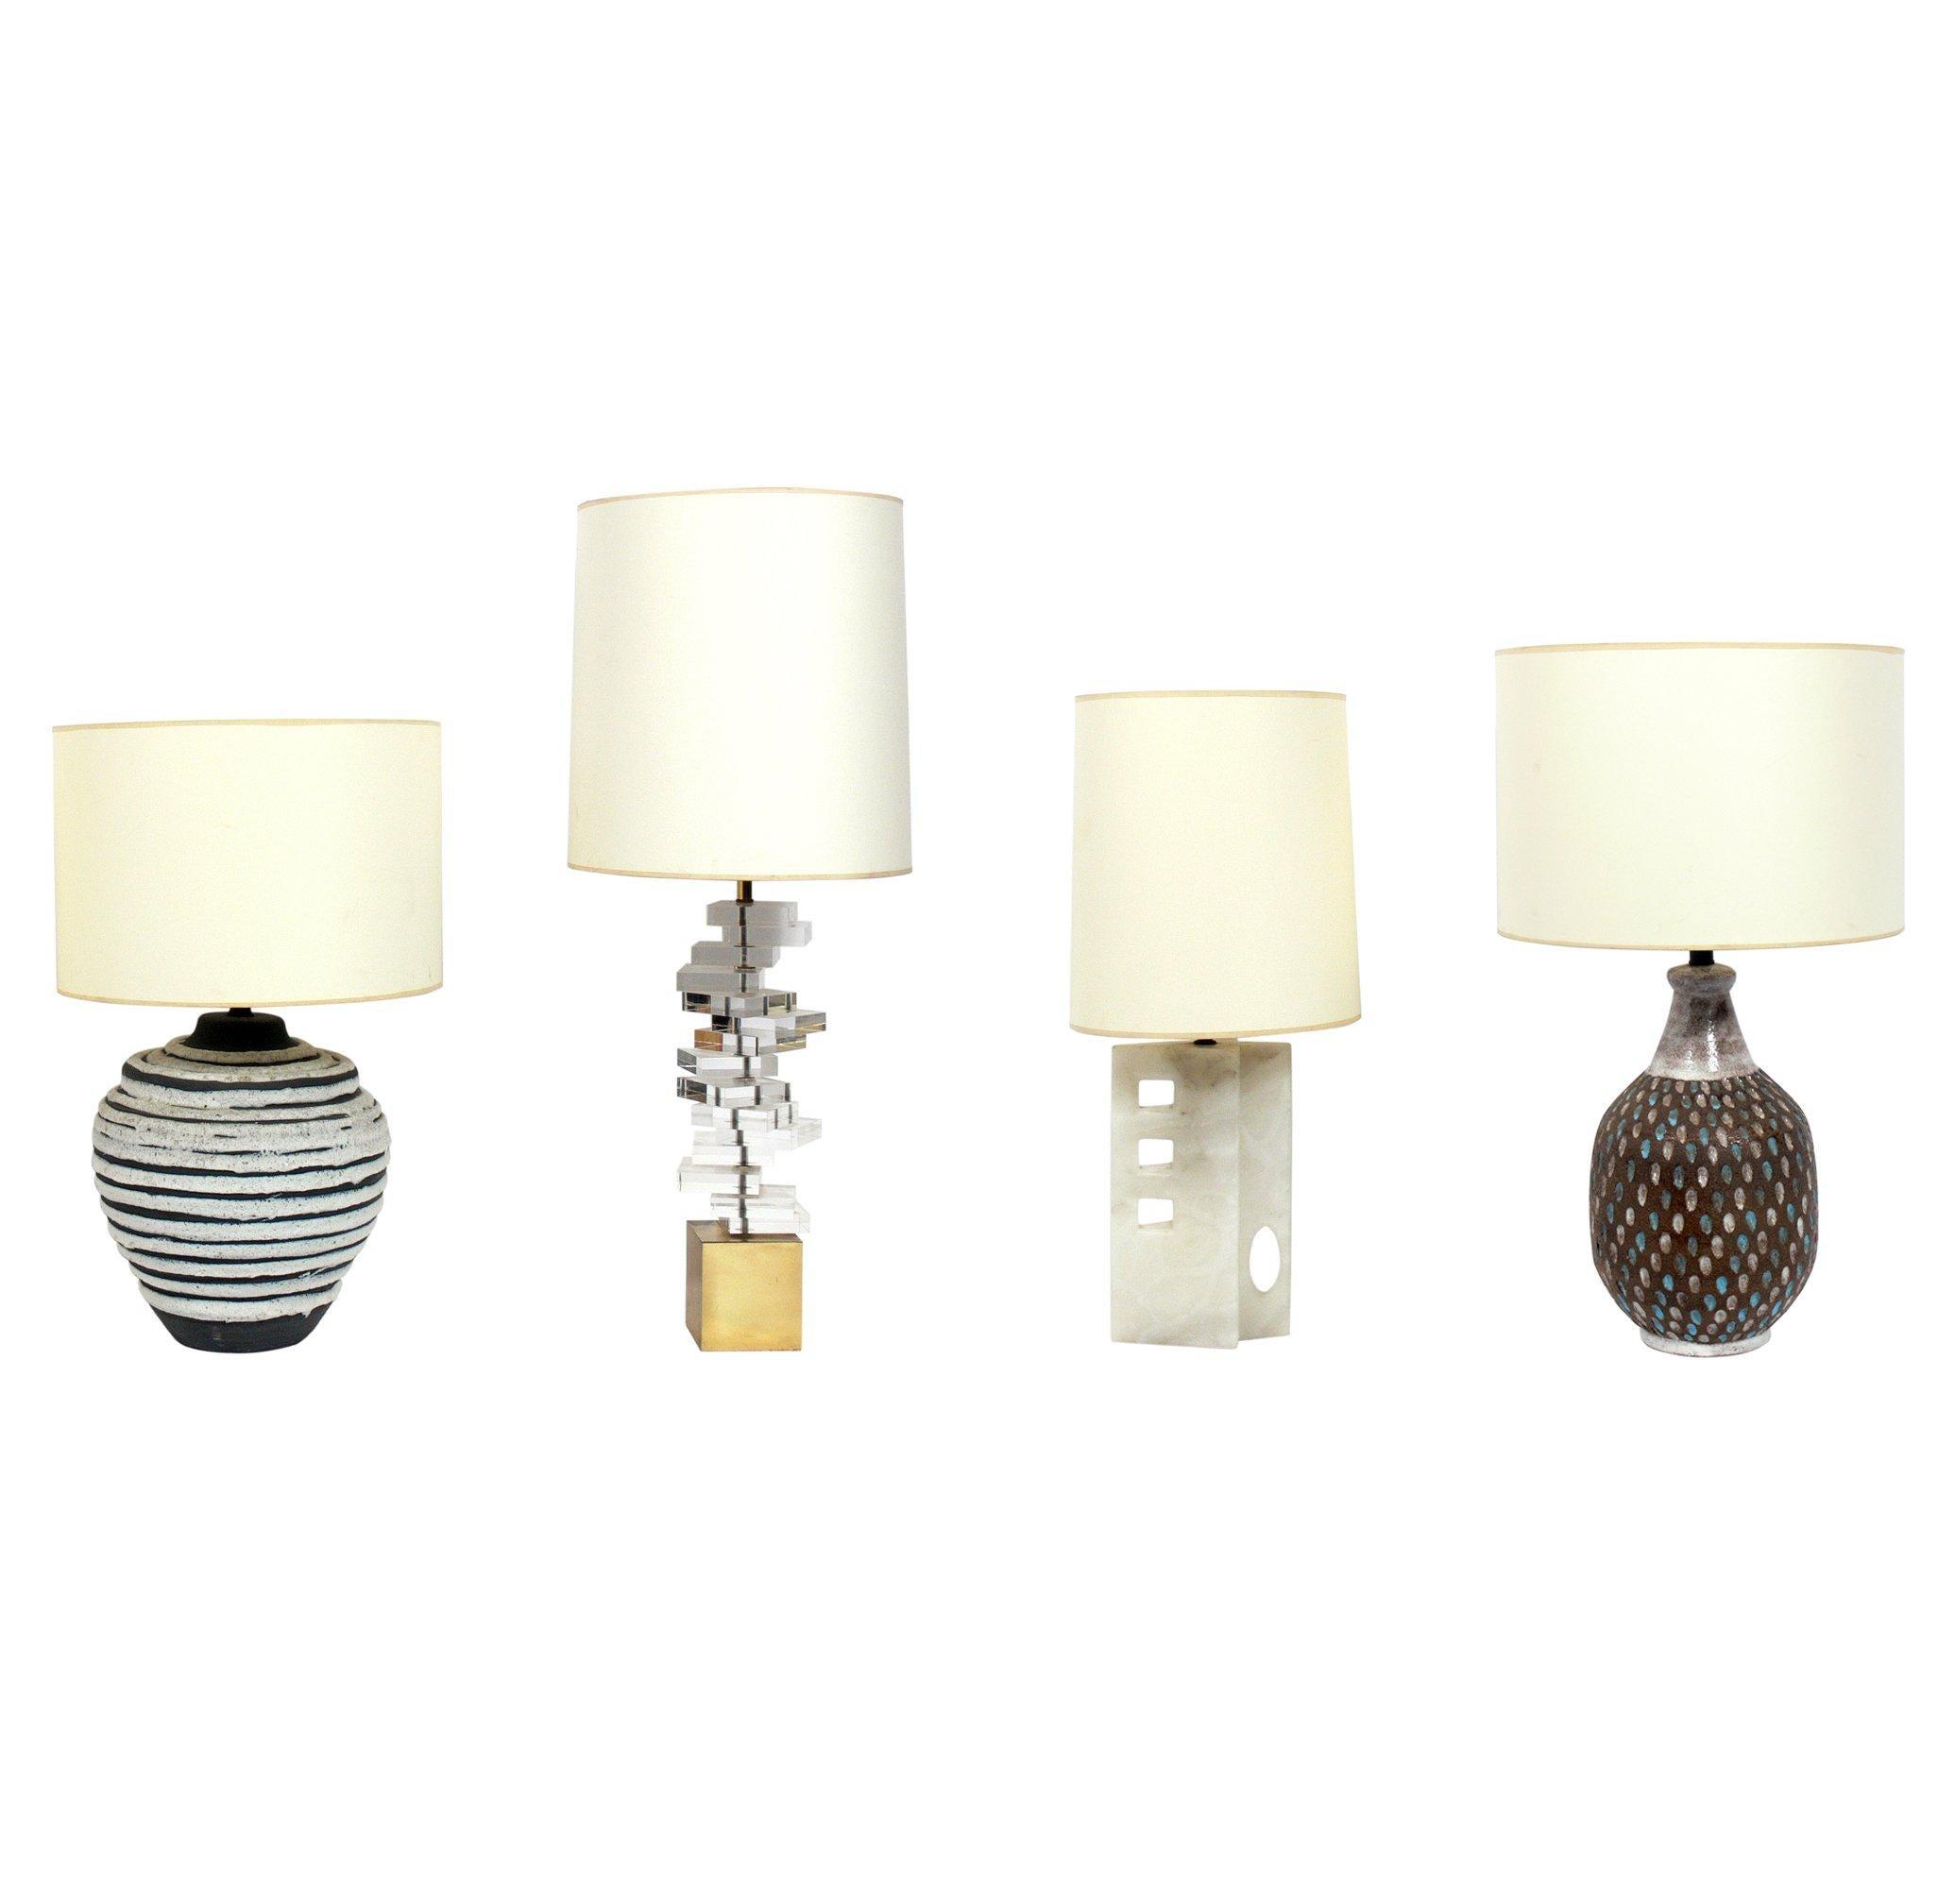 Selection of Midcentury Italian Lamps